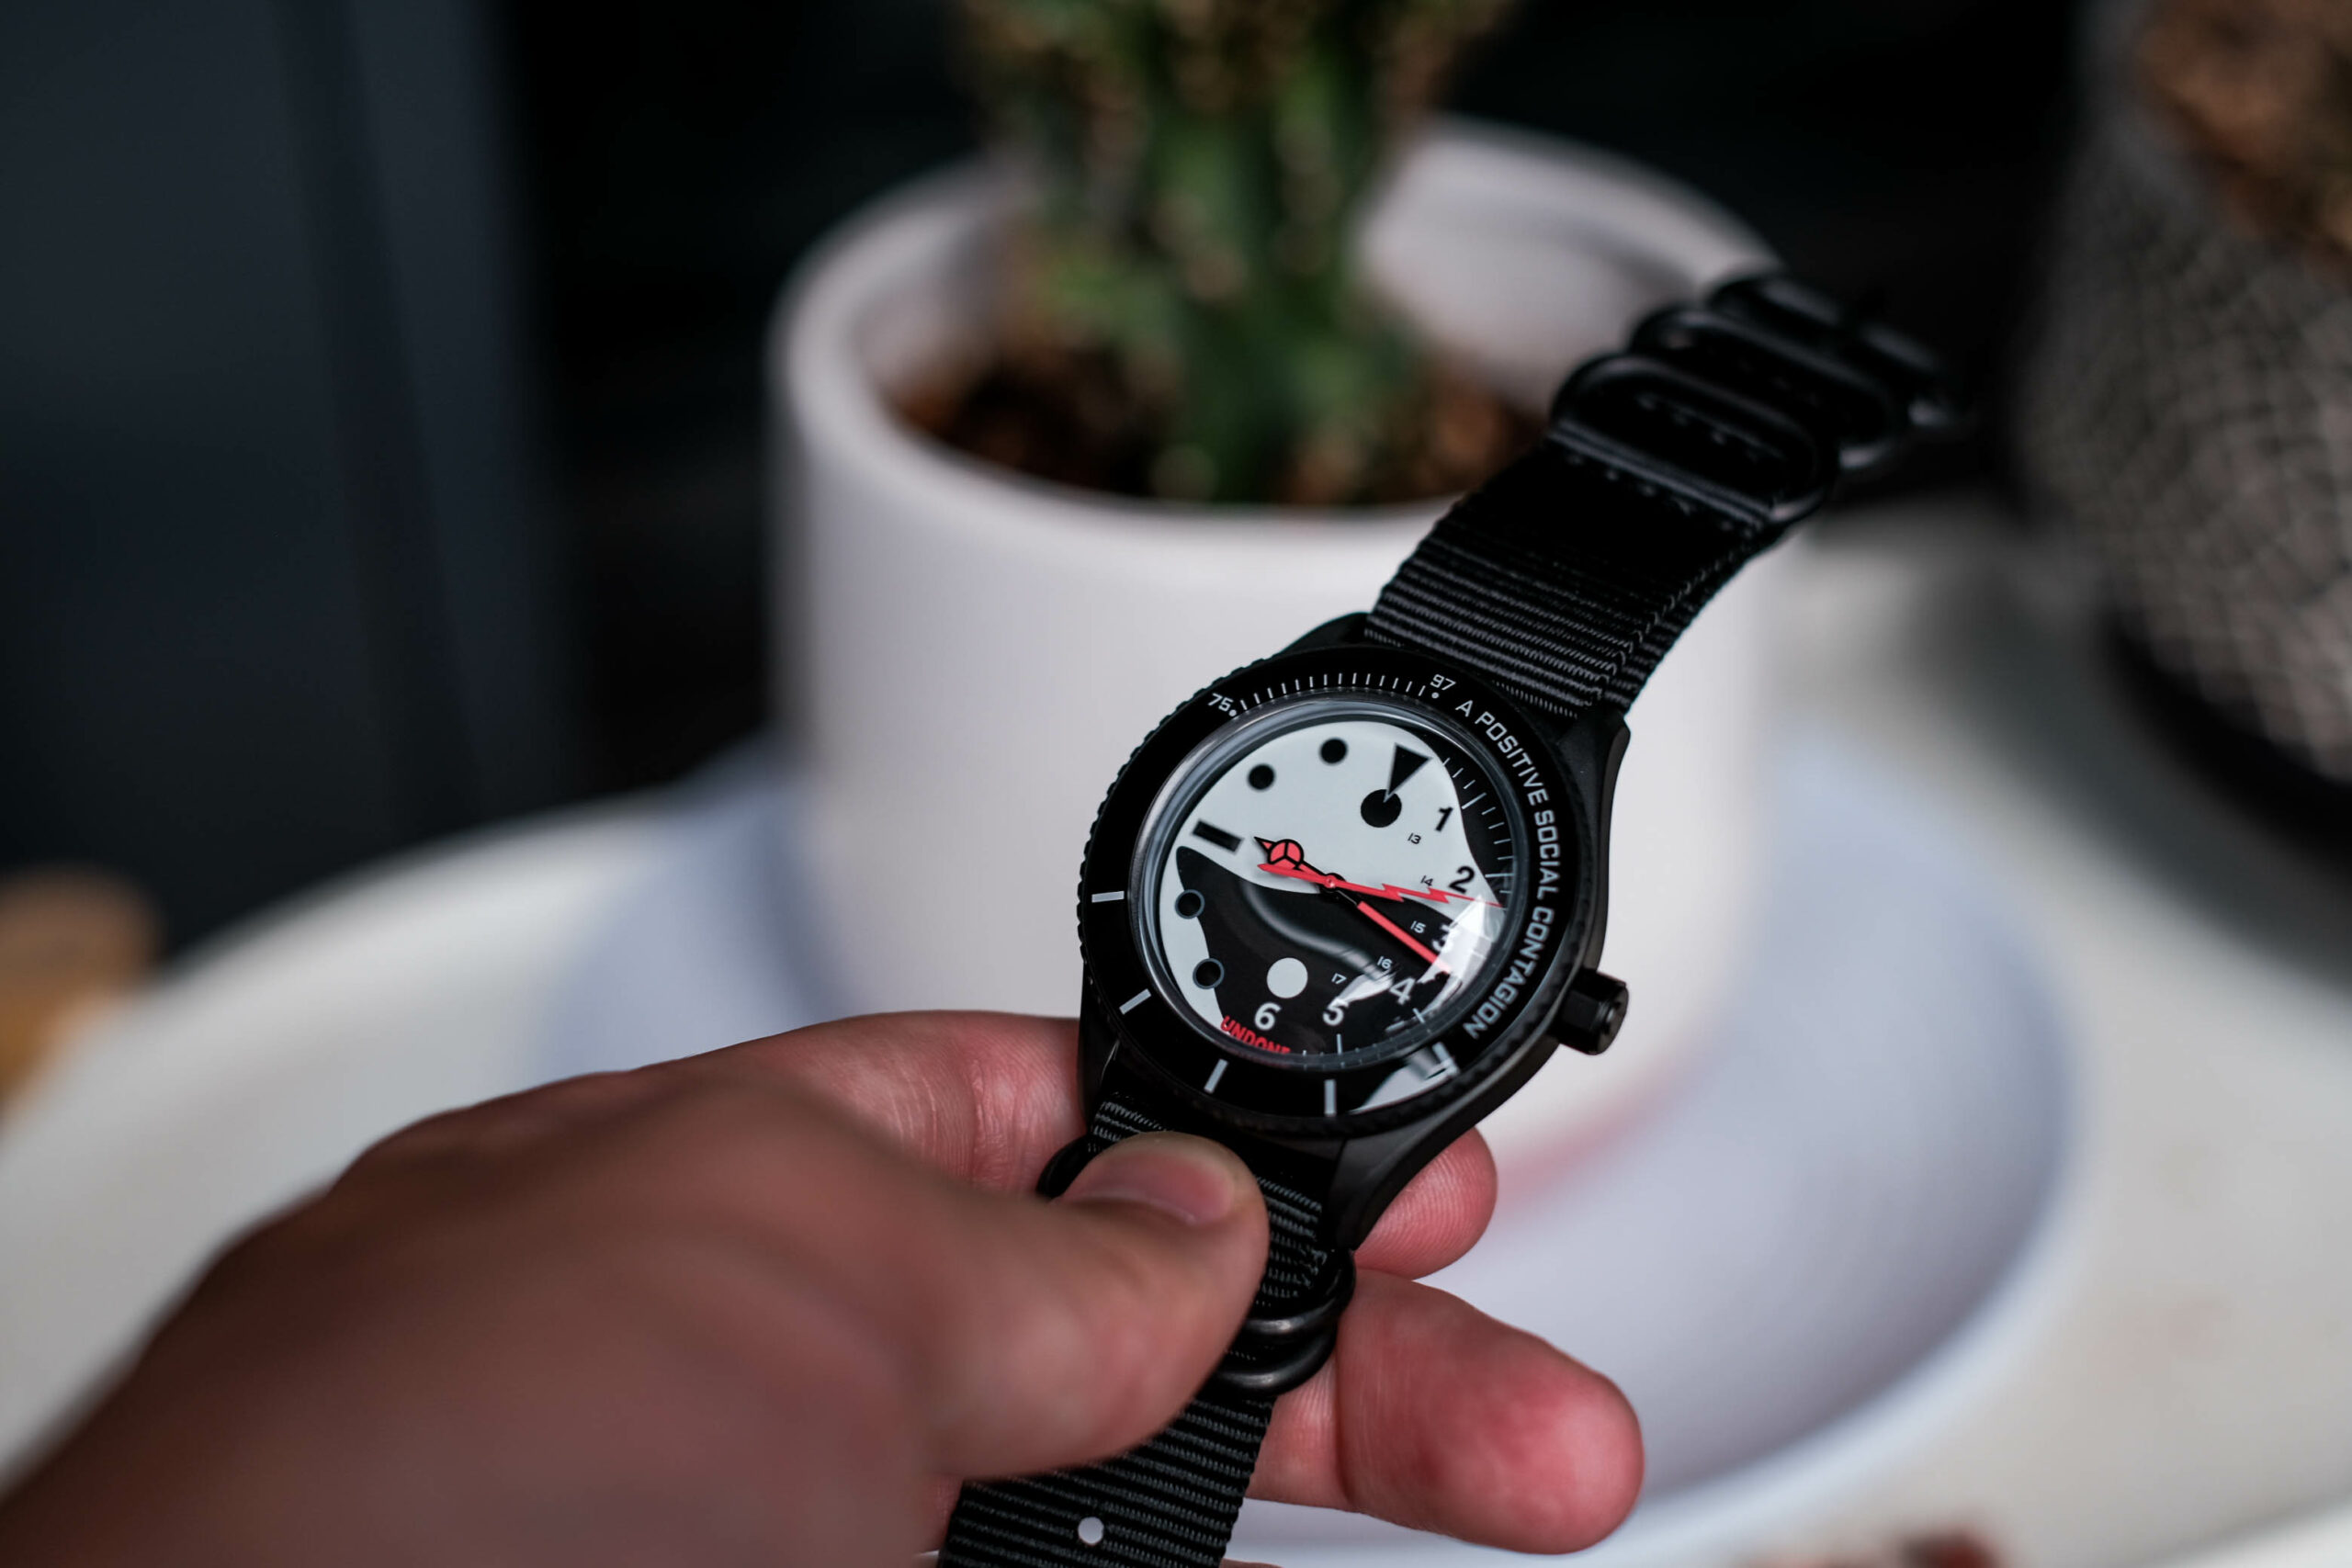 Undone Staple watch dial